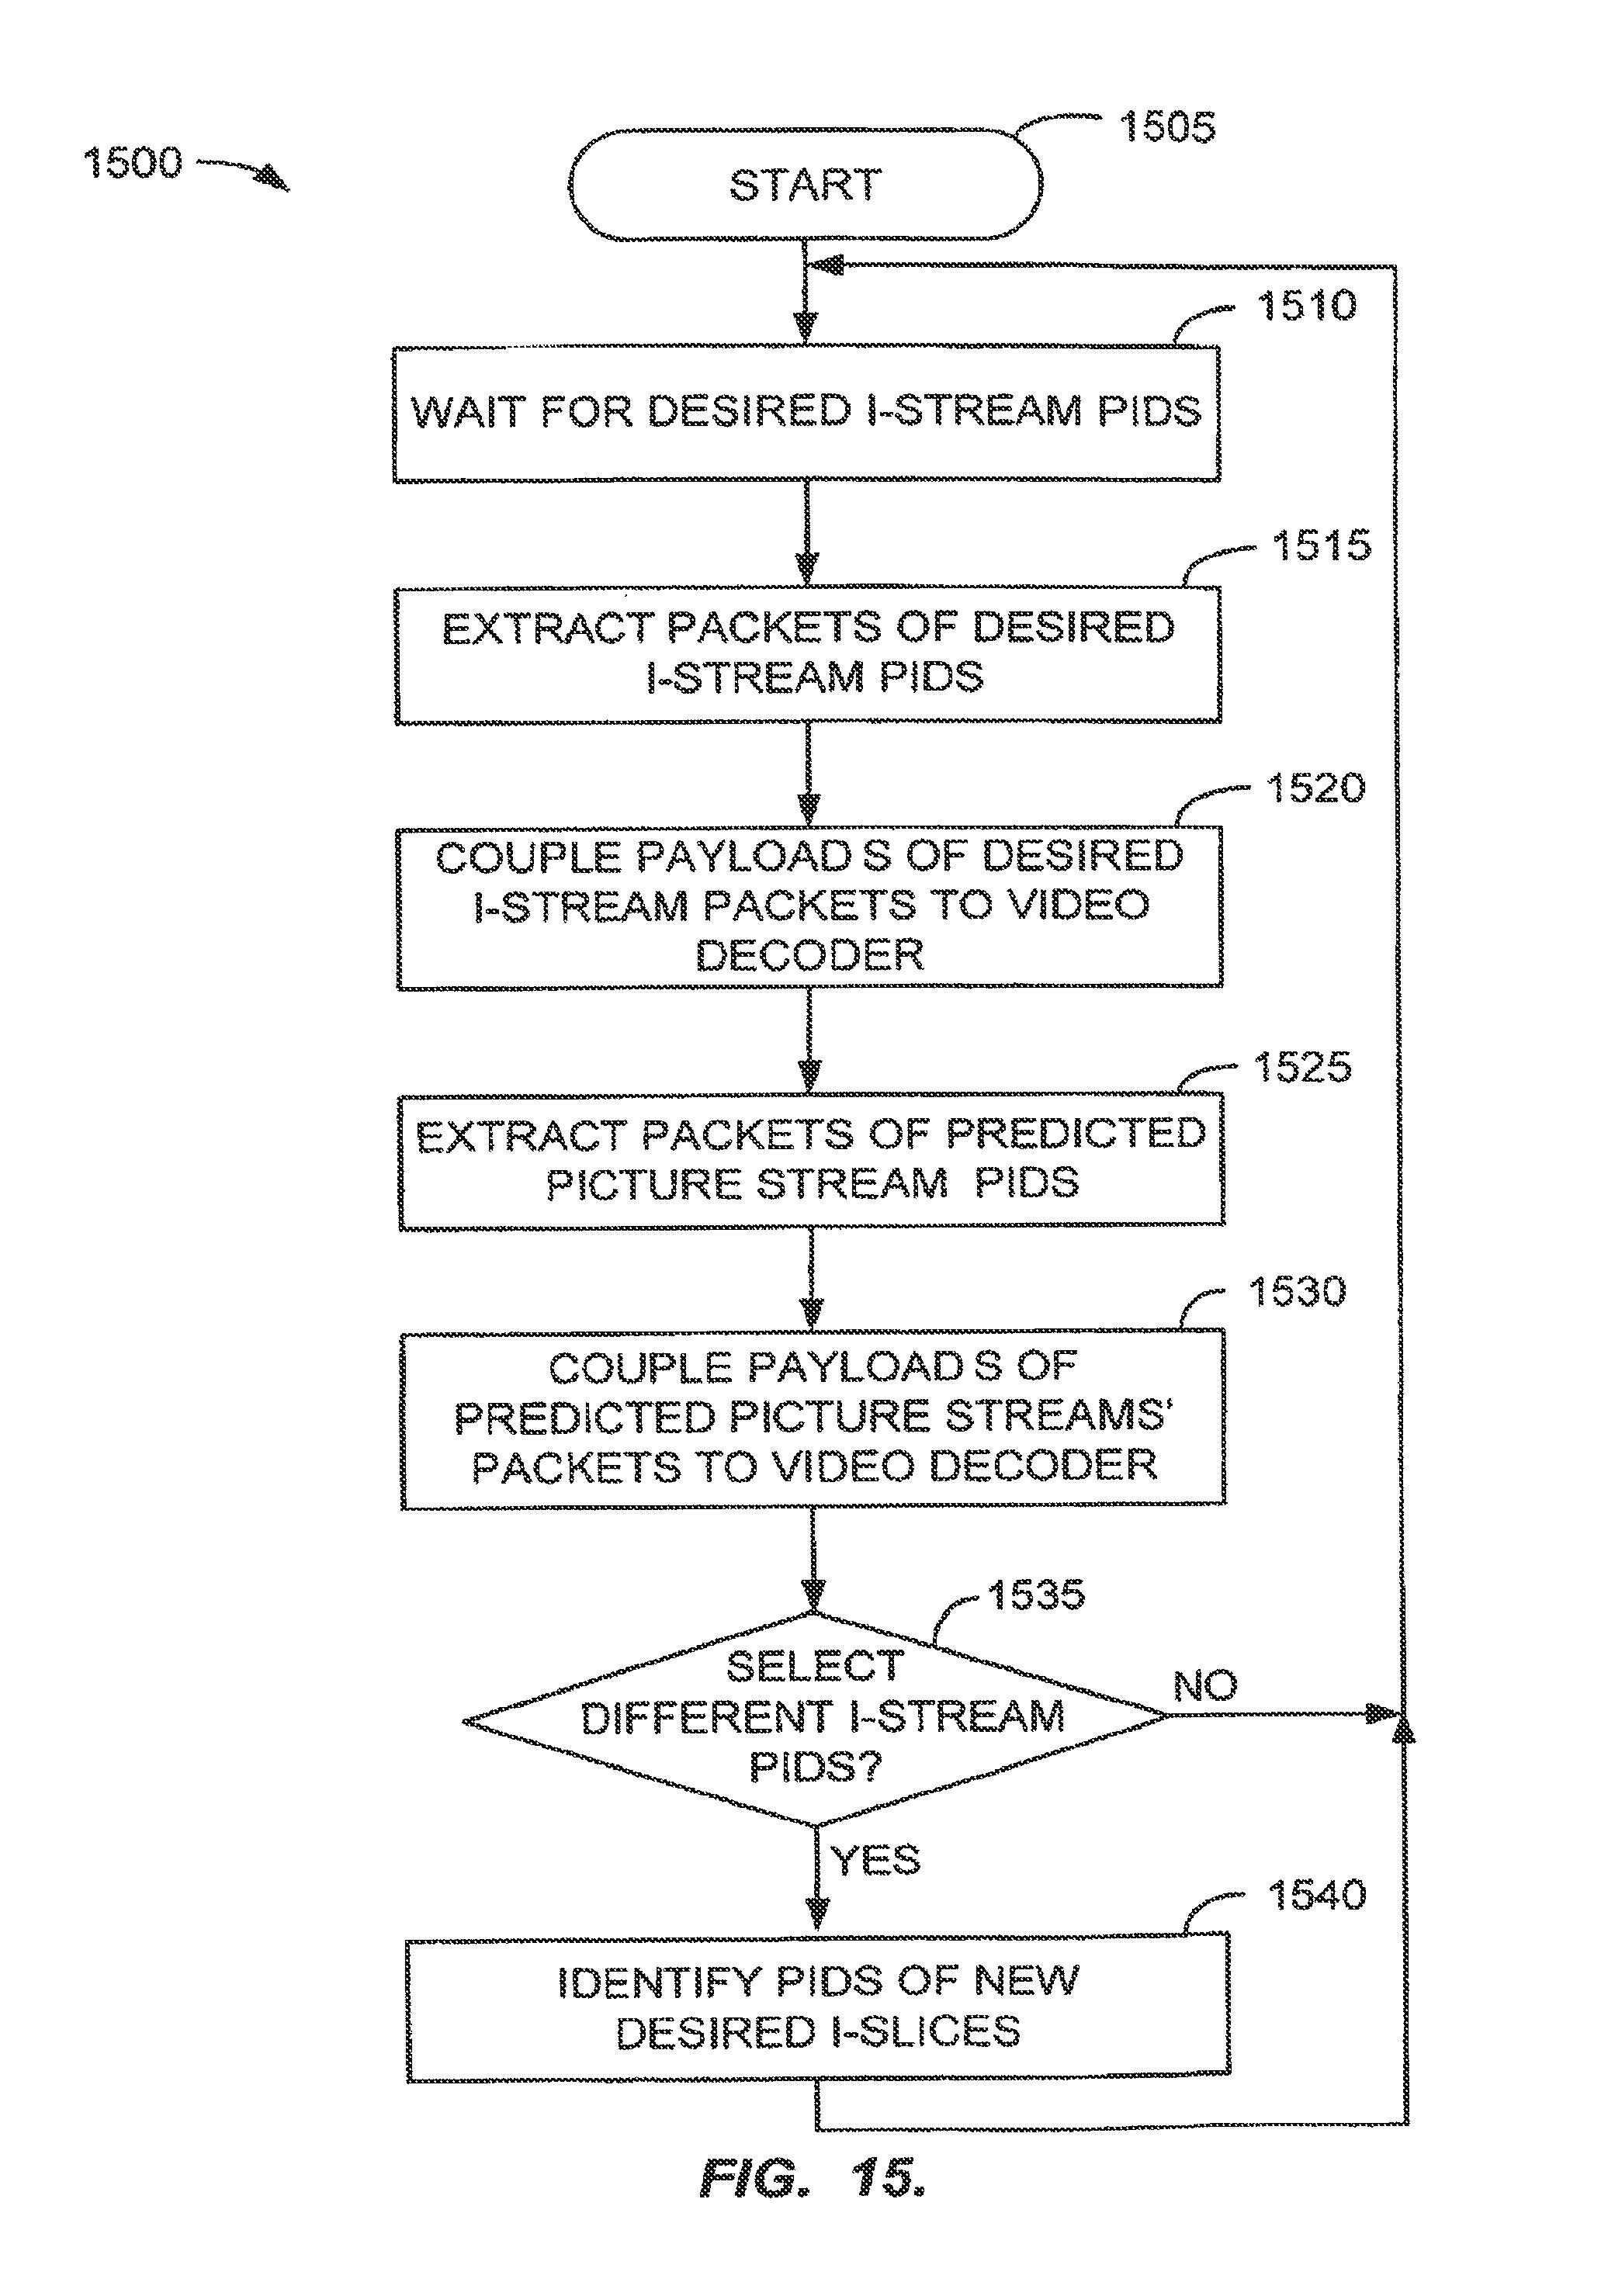 Patent Us 8930998 B2 Pictnetworkdiagramregionalcableheadenddiagram Images